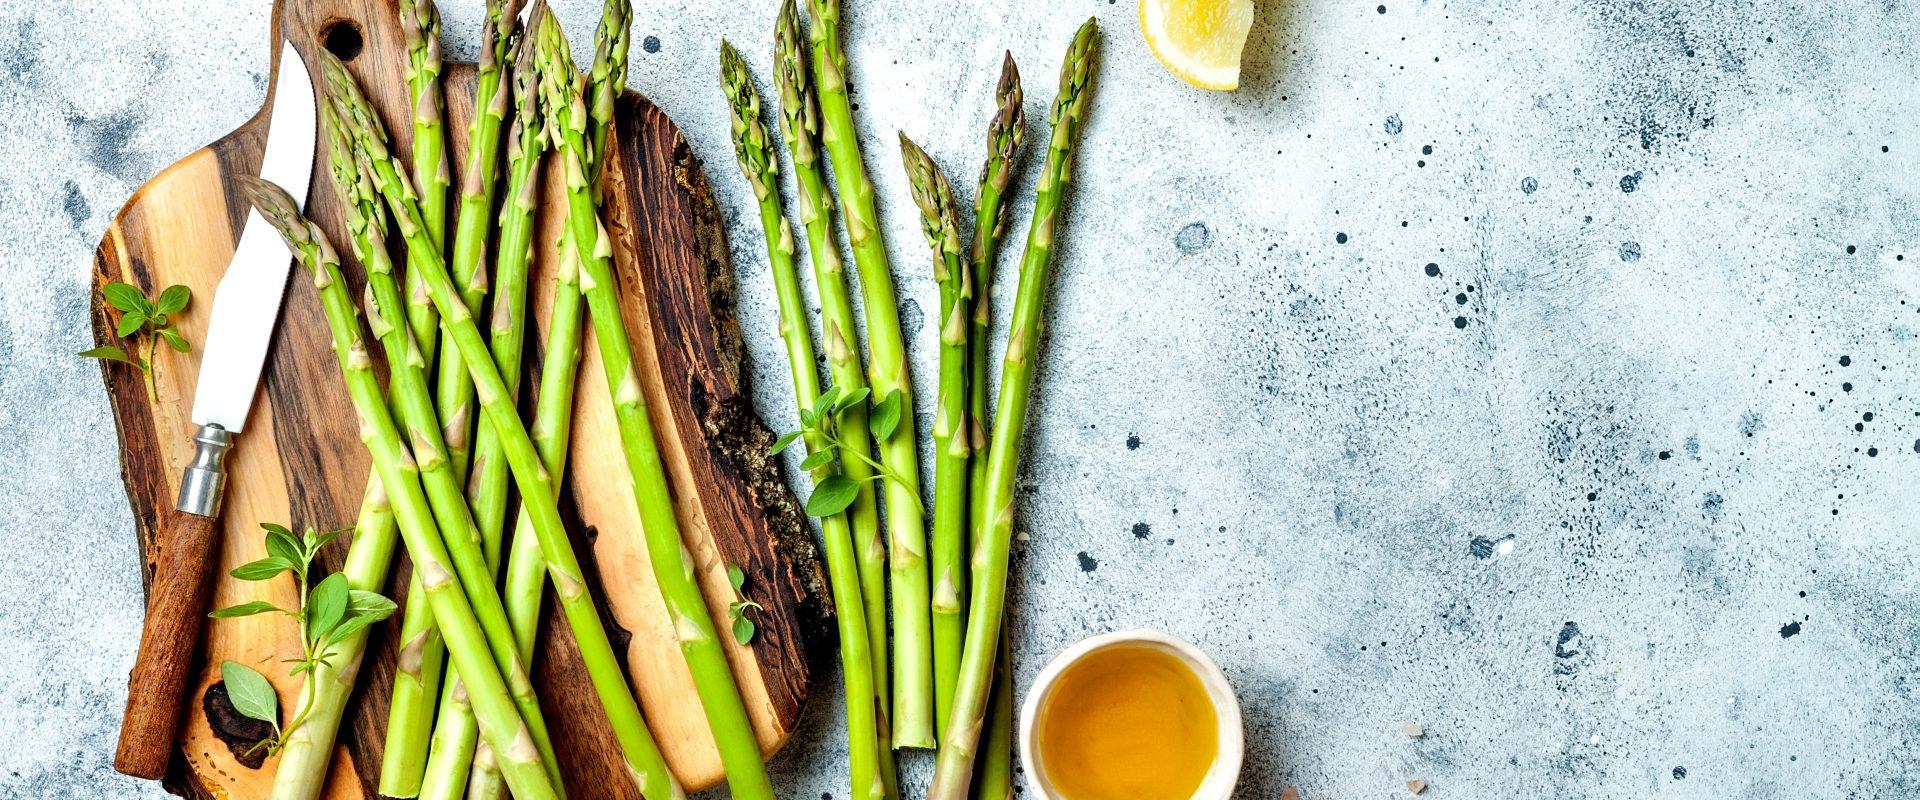 Szparagi dobre na obrzęki - przepis na szparagi.